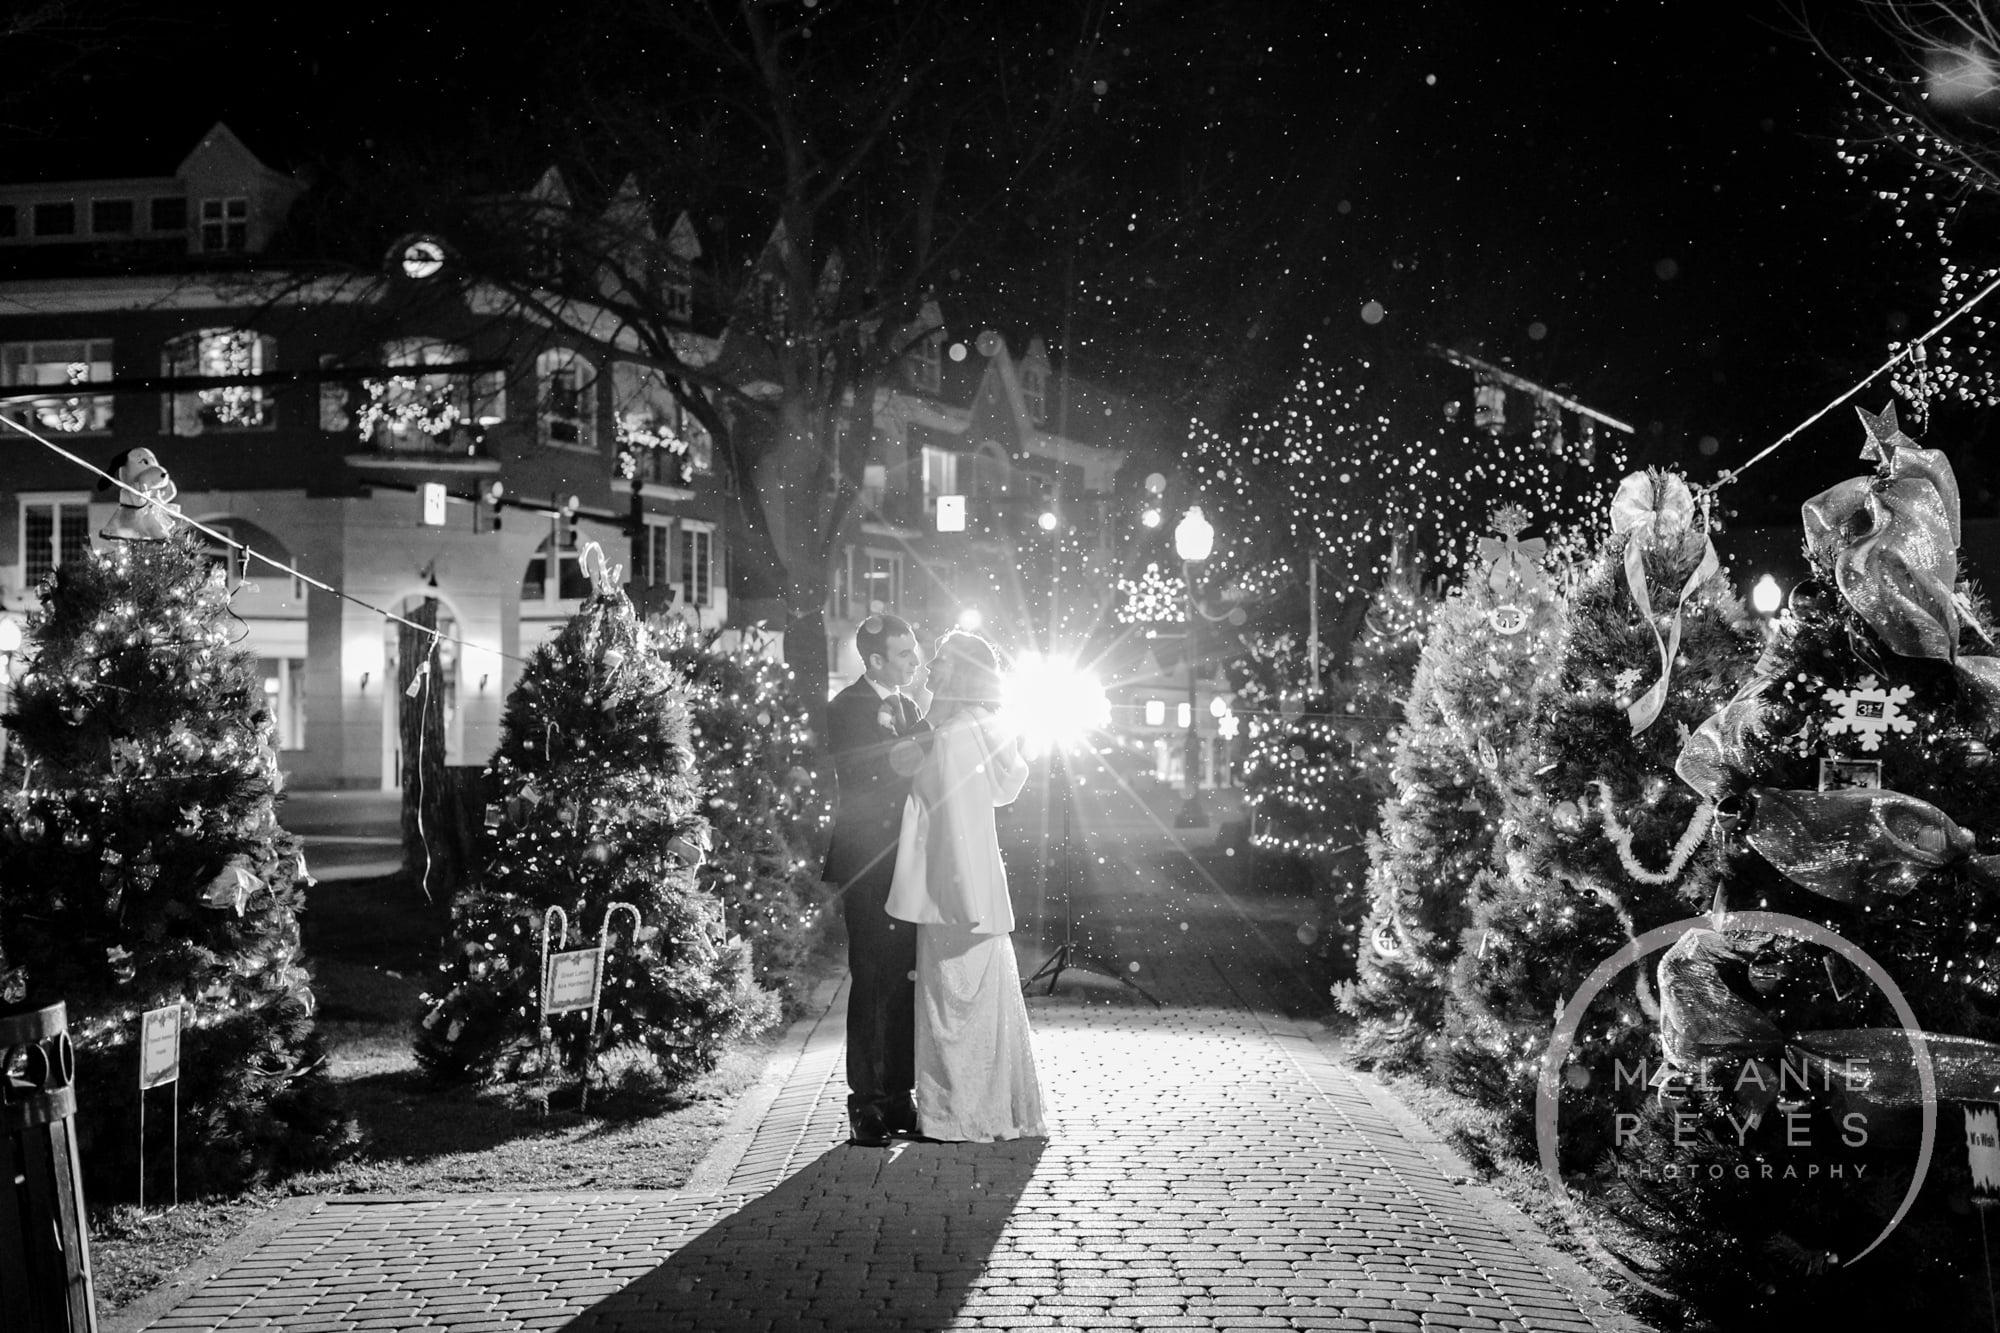 2015_ann_arbor_wedding_photographer_melaniereyes_064.JPG